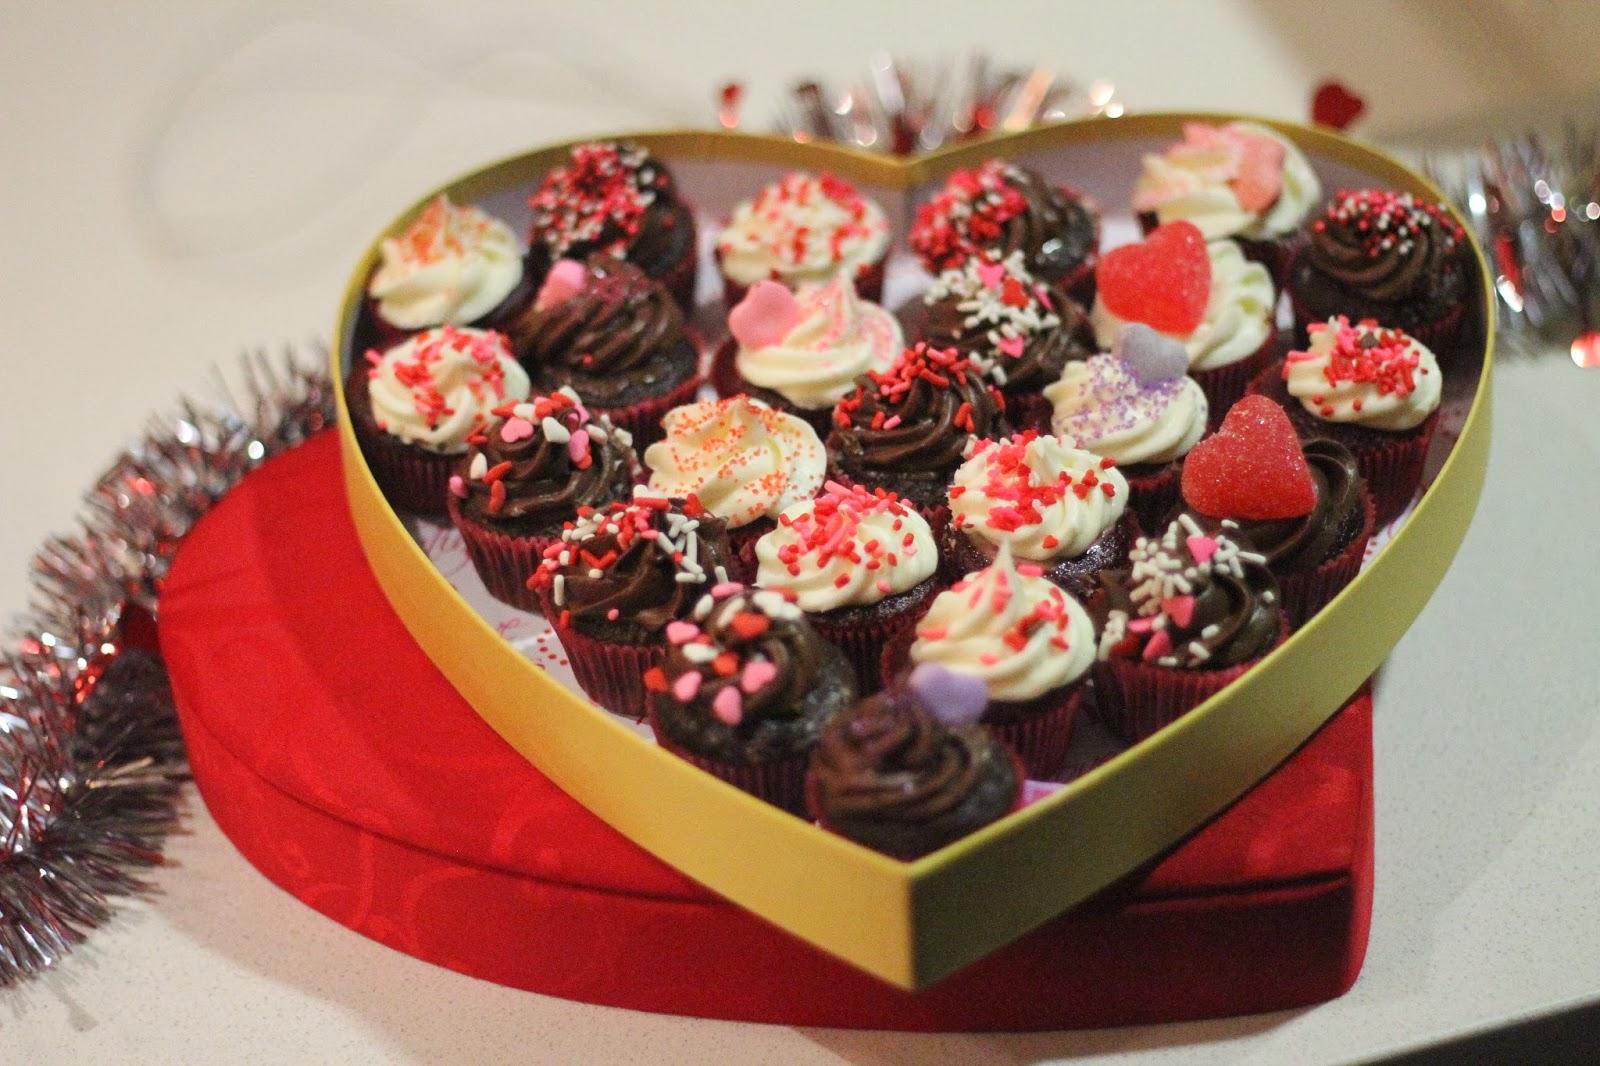 Box of Cupcakes